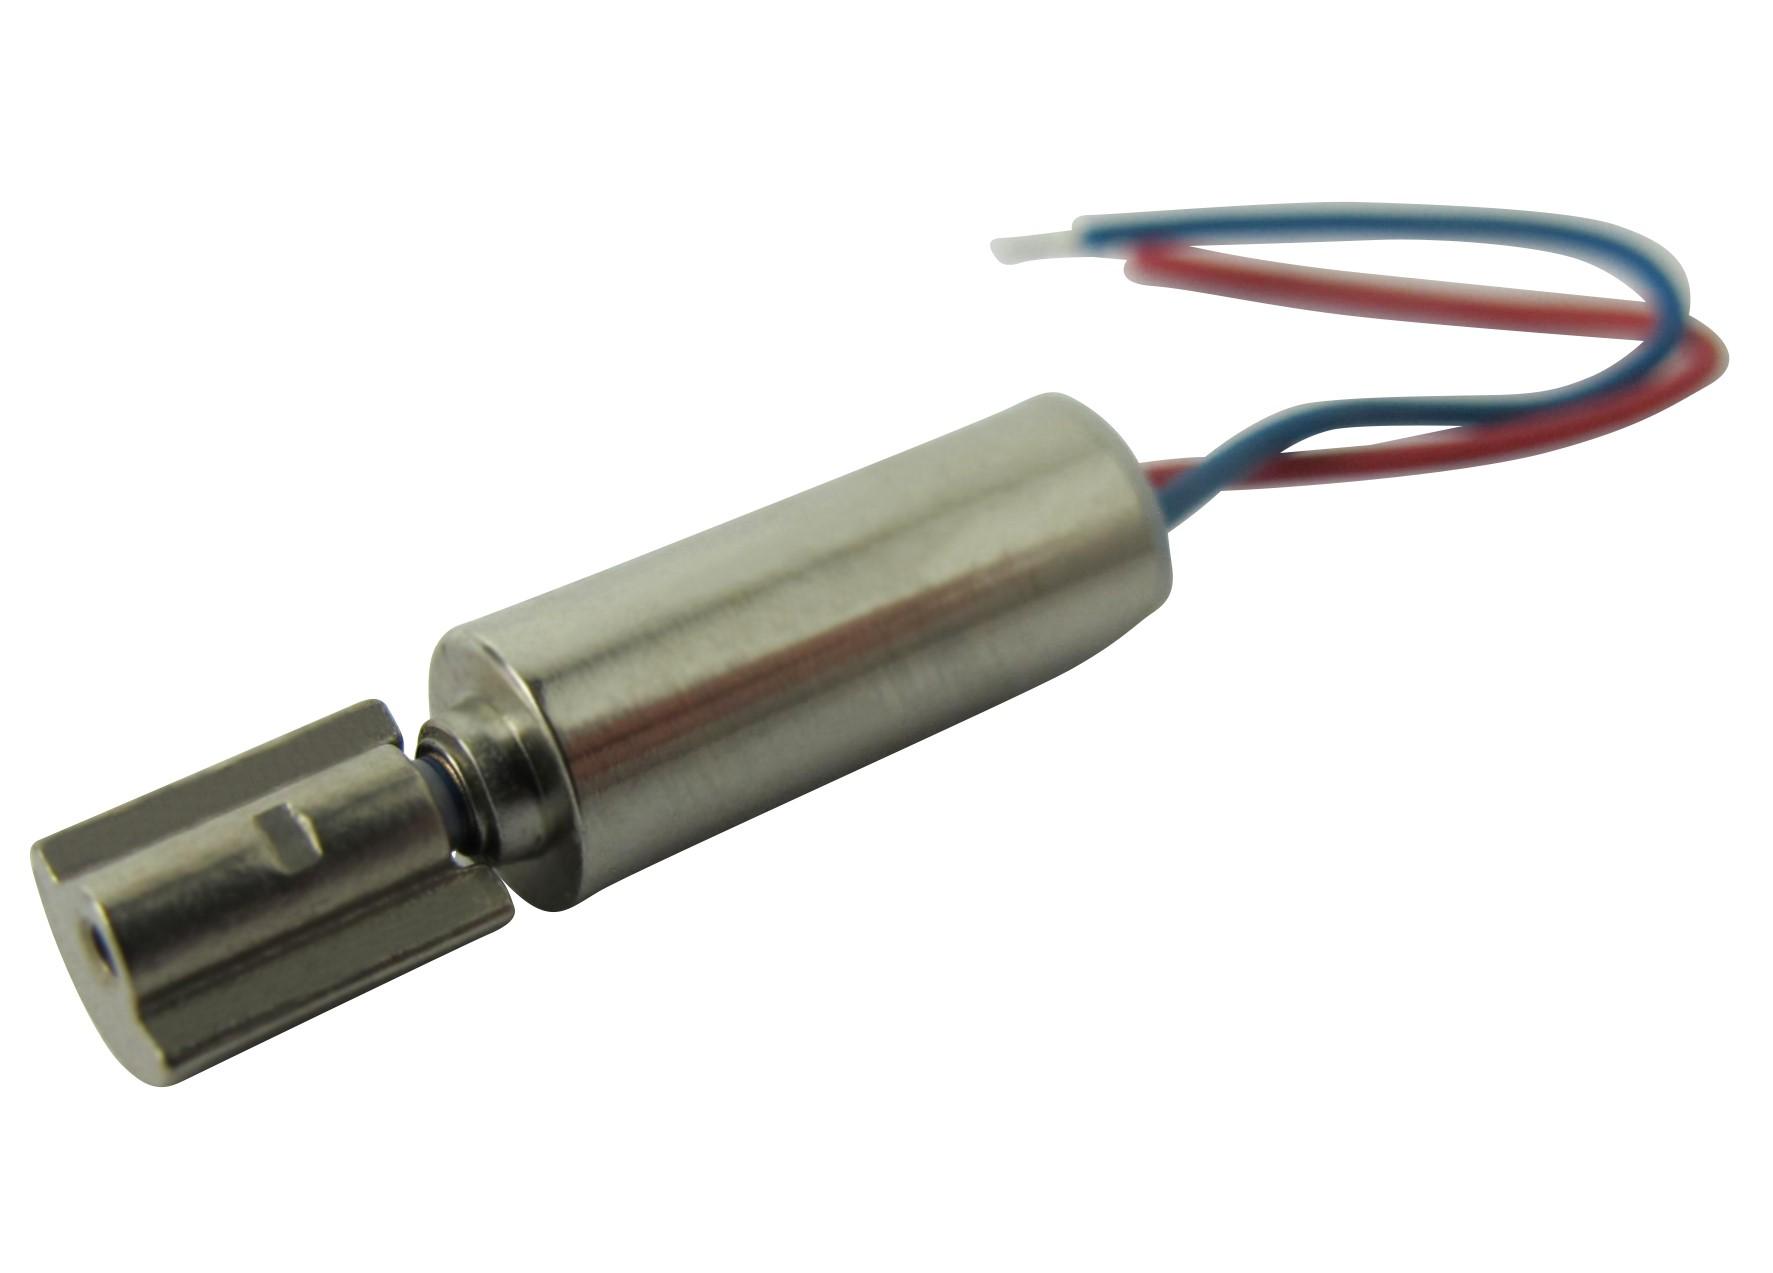 Z4SL2B0280001 Cylindrical Vibrator Motor